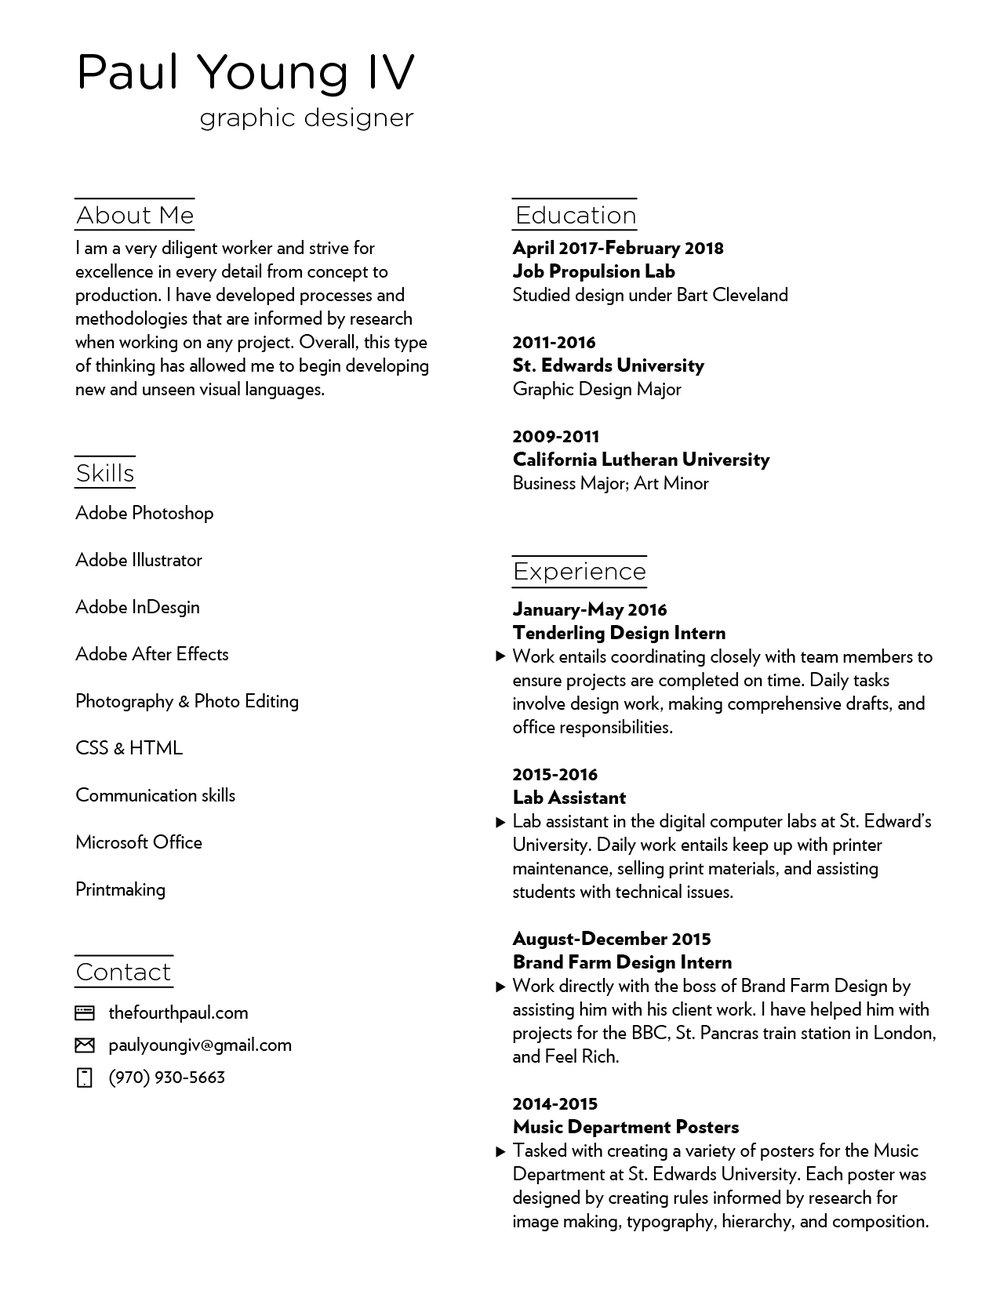 Resume012618-03.jpg